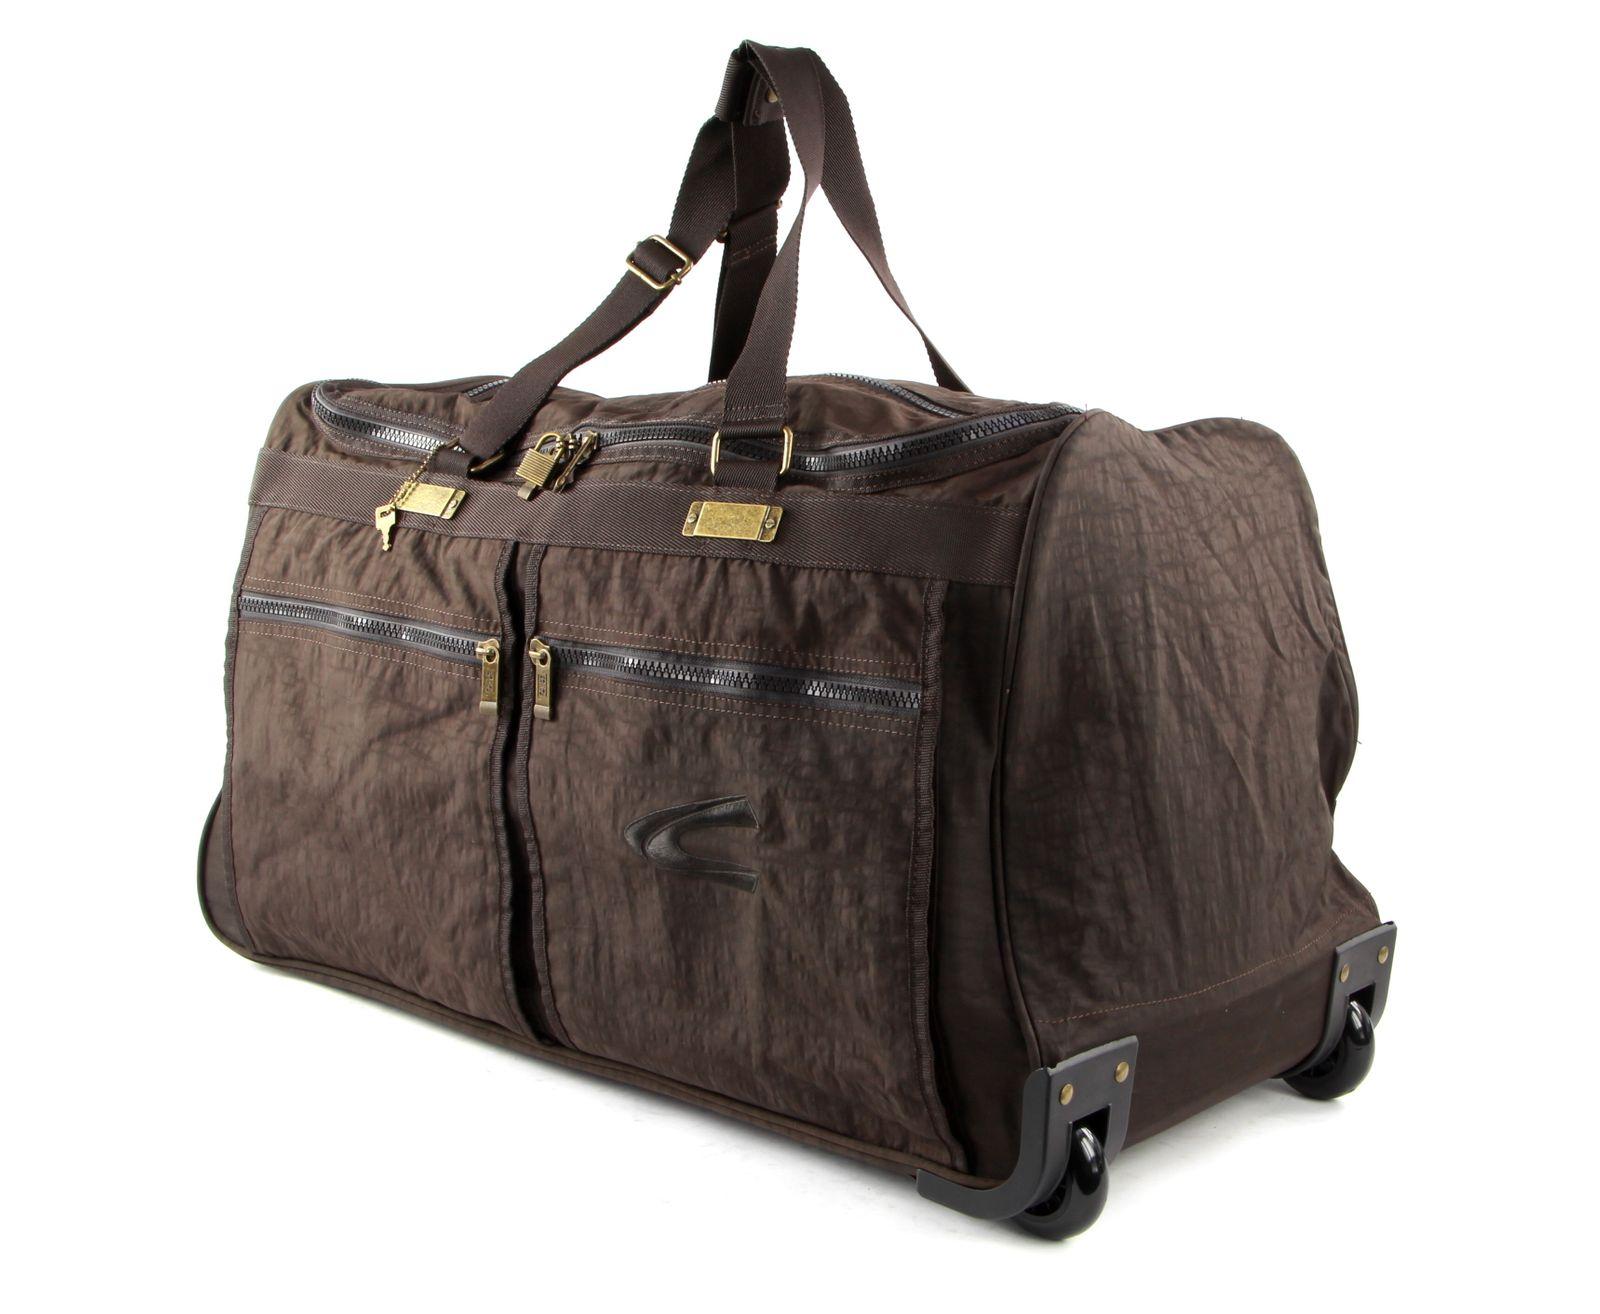 Camel Active Journey Wheeled Travel Bag Brown